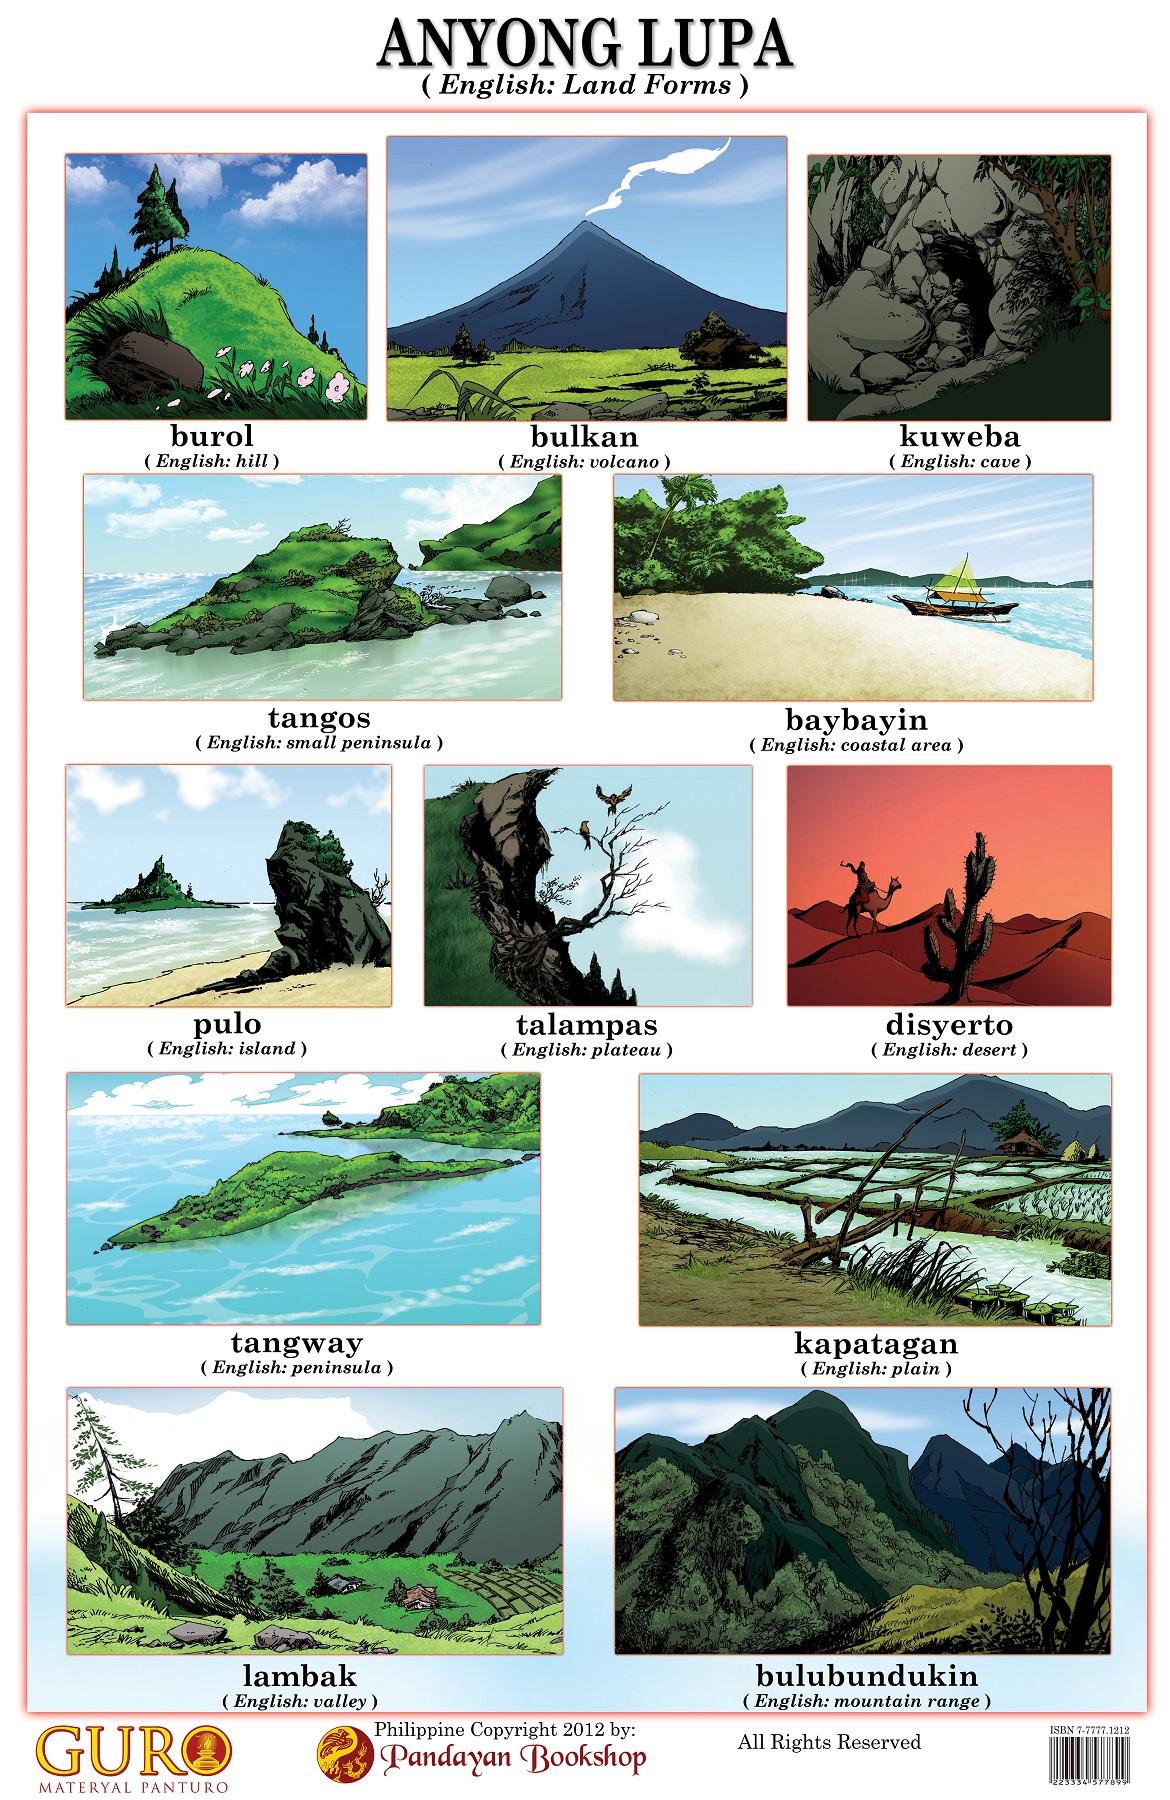 Yamang Lupa Chart My Homeworks: Mga Anyo...